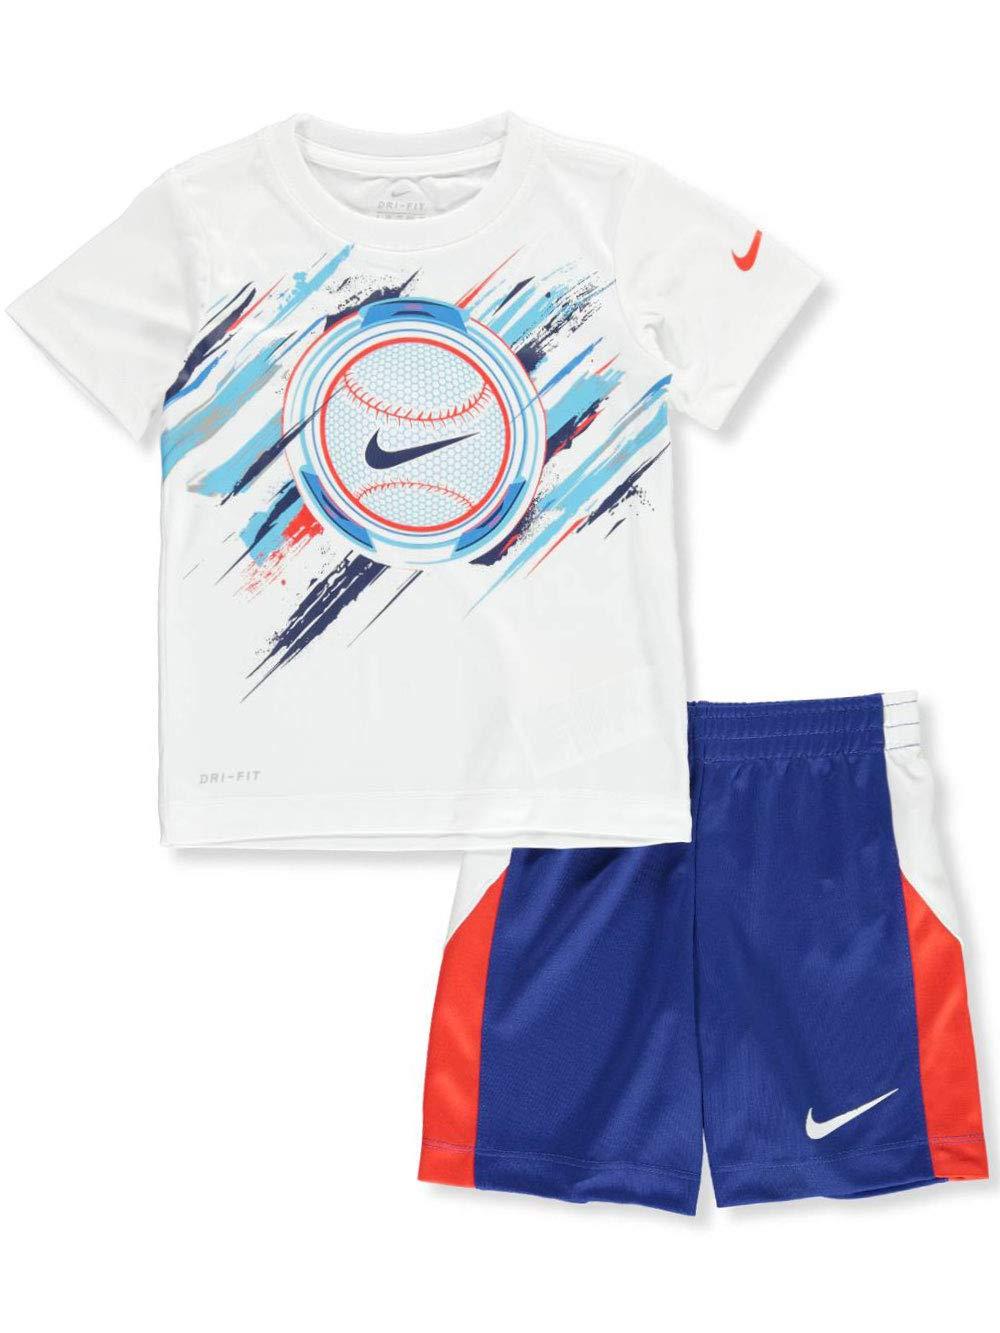 Nike Boys' 2-Piece Shorts Set Outfit - Indigo, 2t